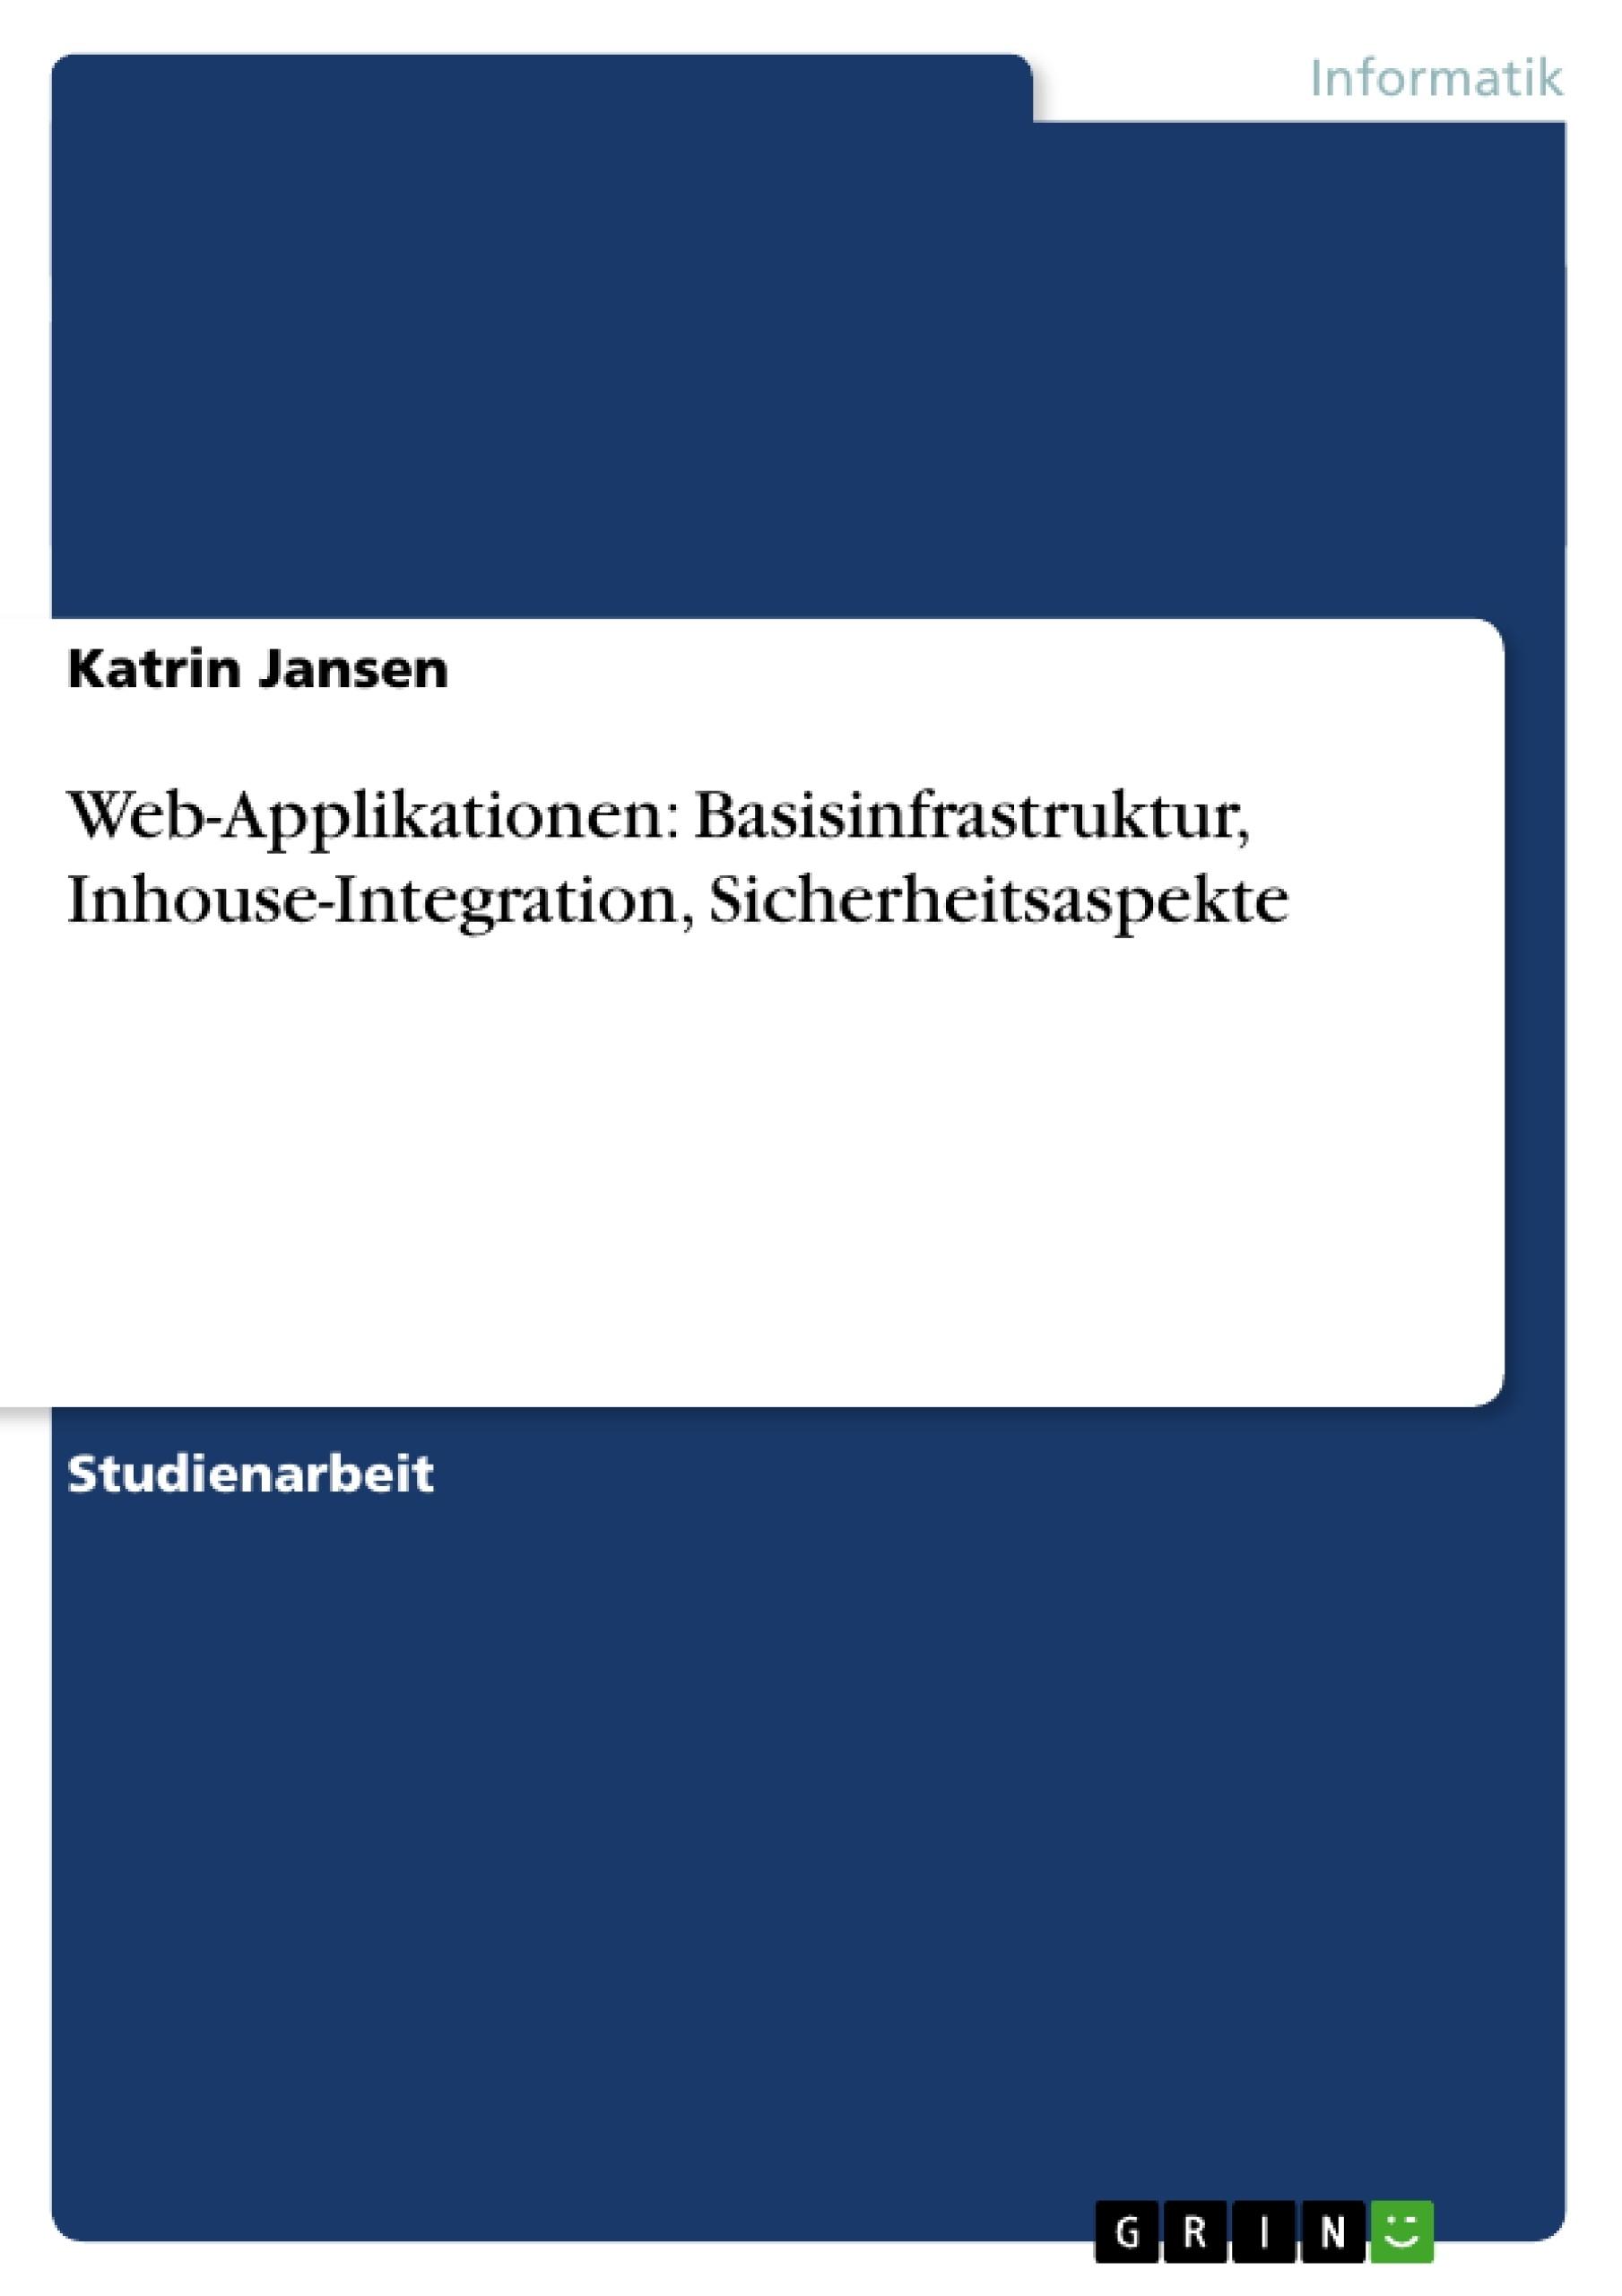 Titel: Web-Applikationen: Basisinfrastruktur, Inhouse-Integration, Sicherheitsaspekte